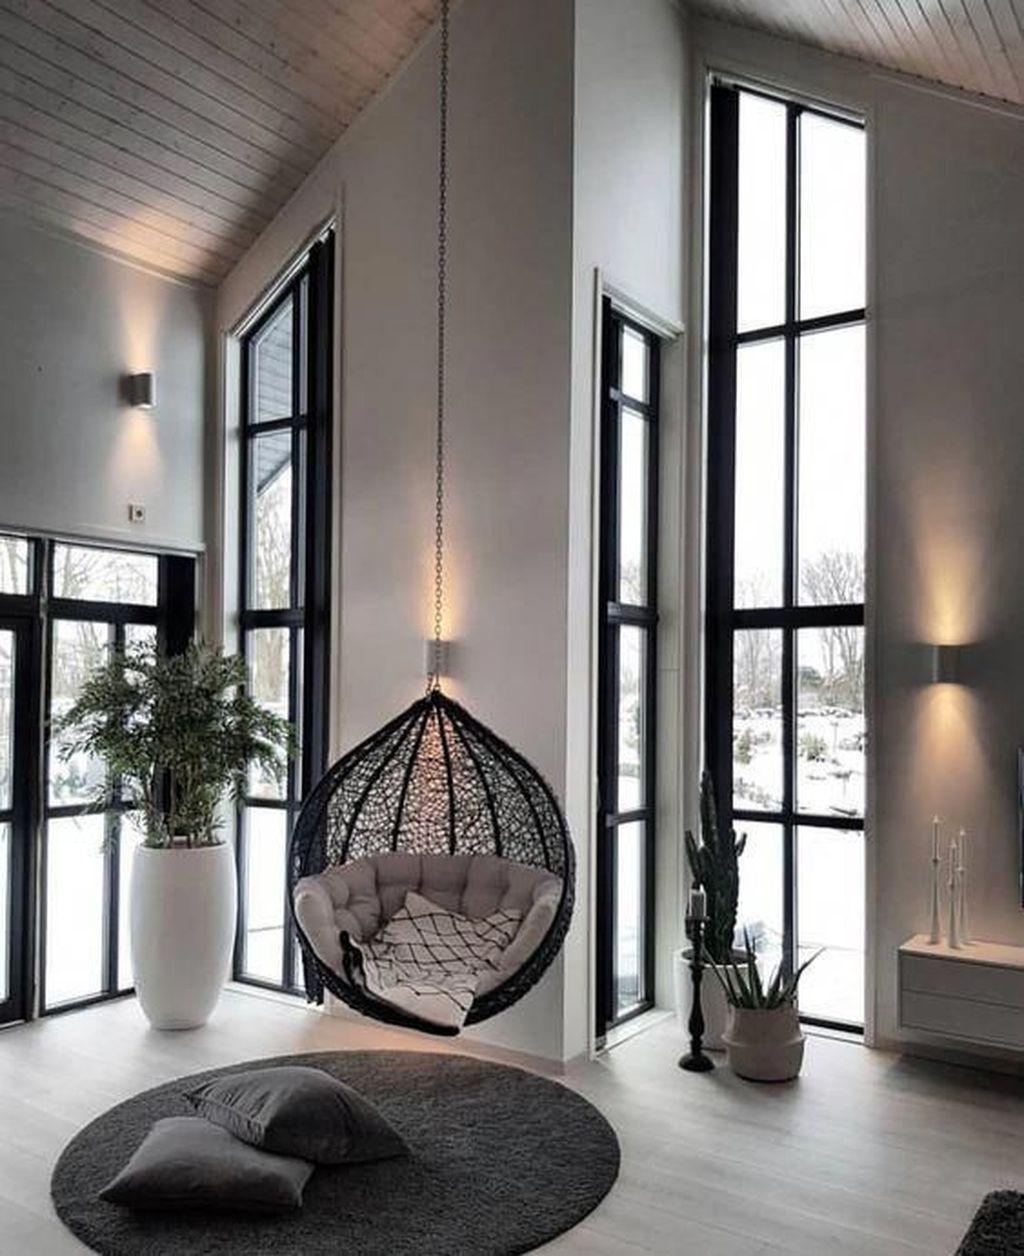 Inspiring Modern Home Furnishings Design Ideas 10